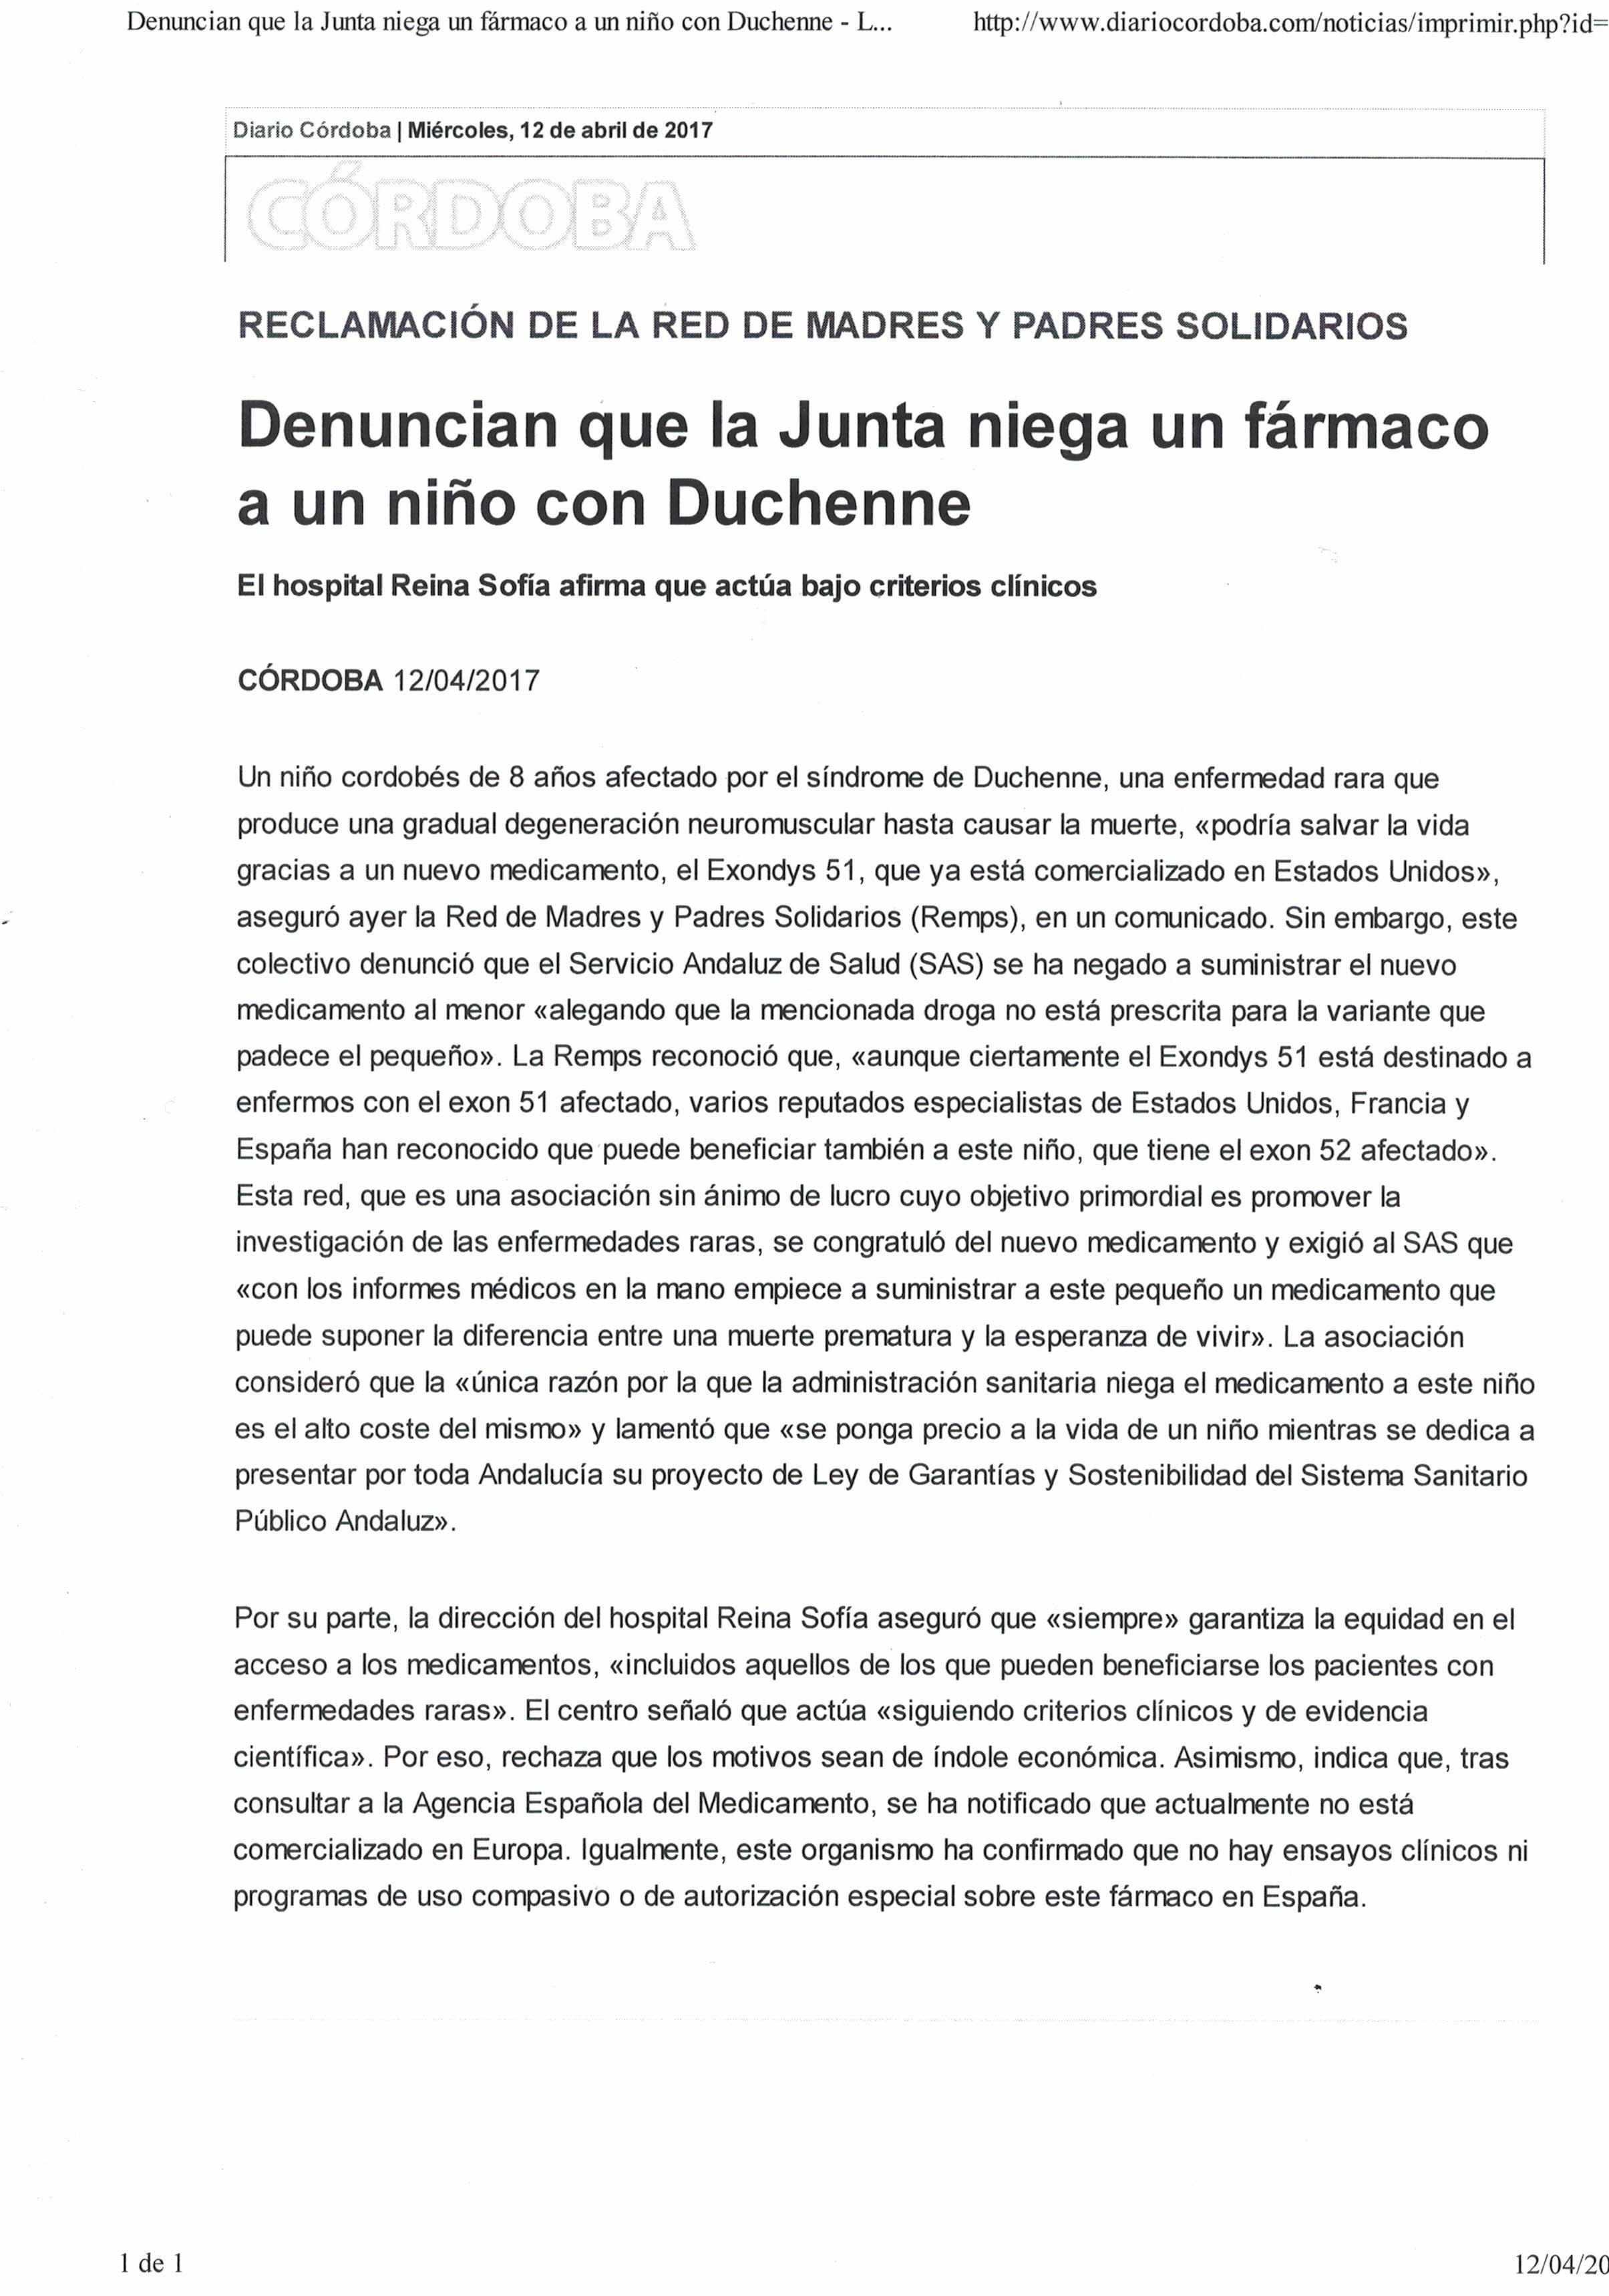 http://reddepadressolidarios.com/img/1paco_1491981426_a.jpg